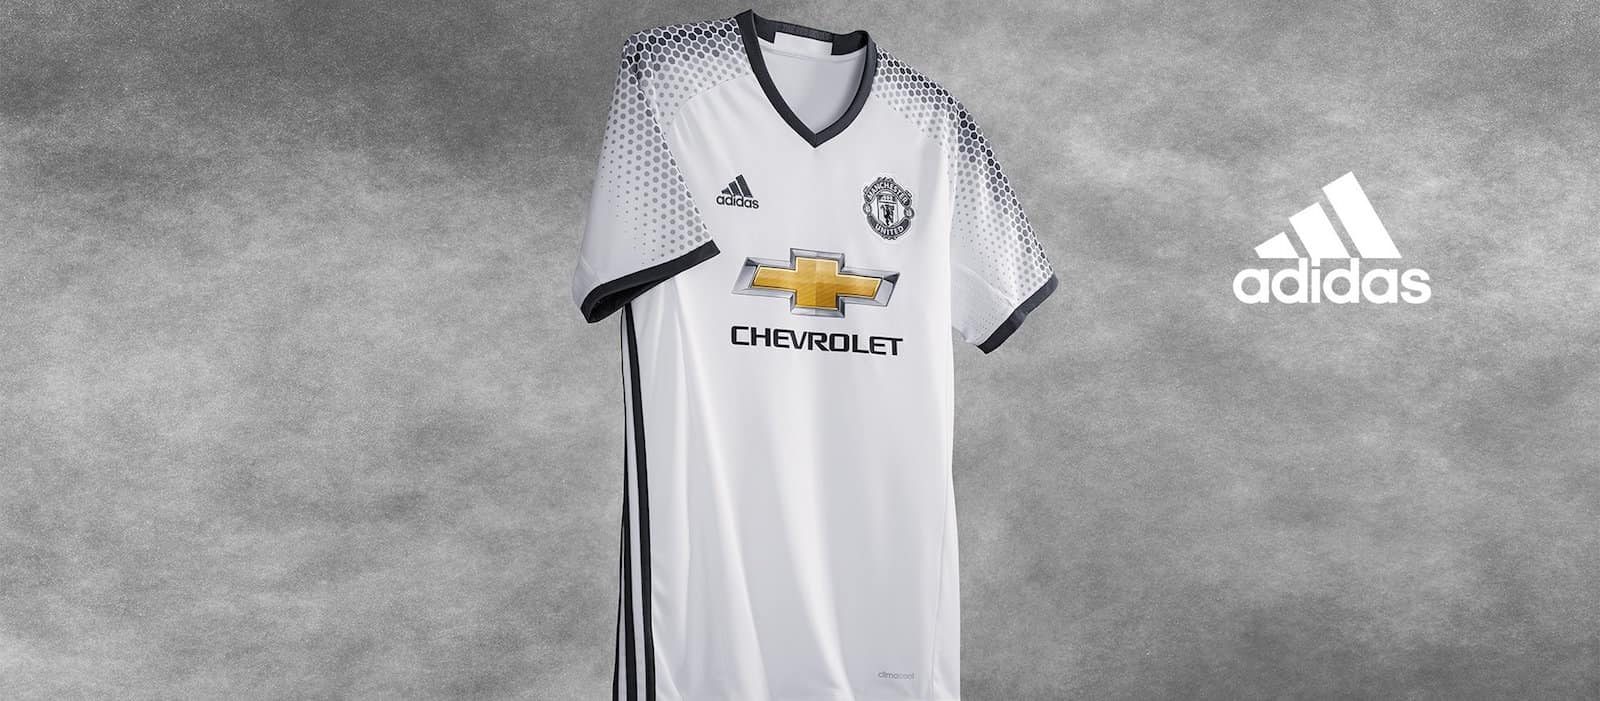 e97ceb44e Manchester United release new 2016 17 third kit